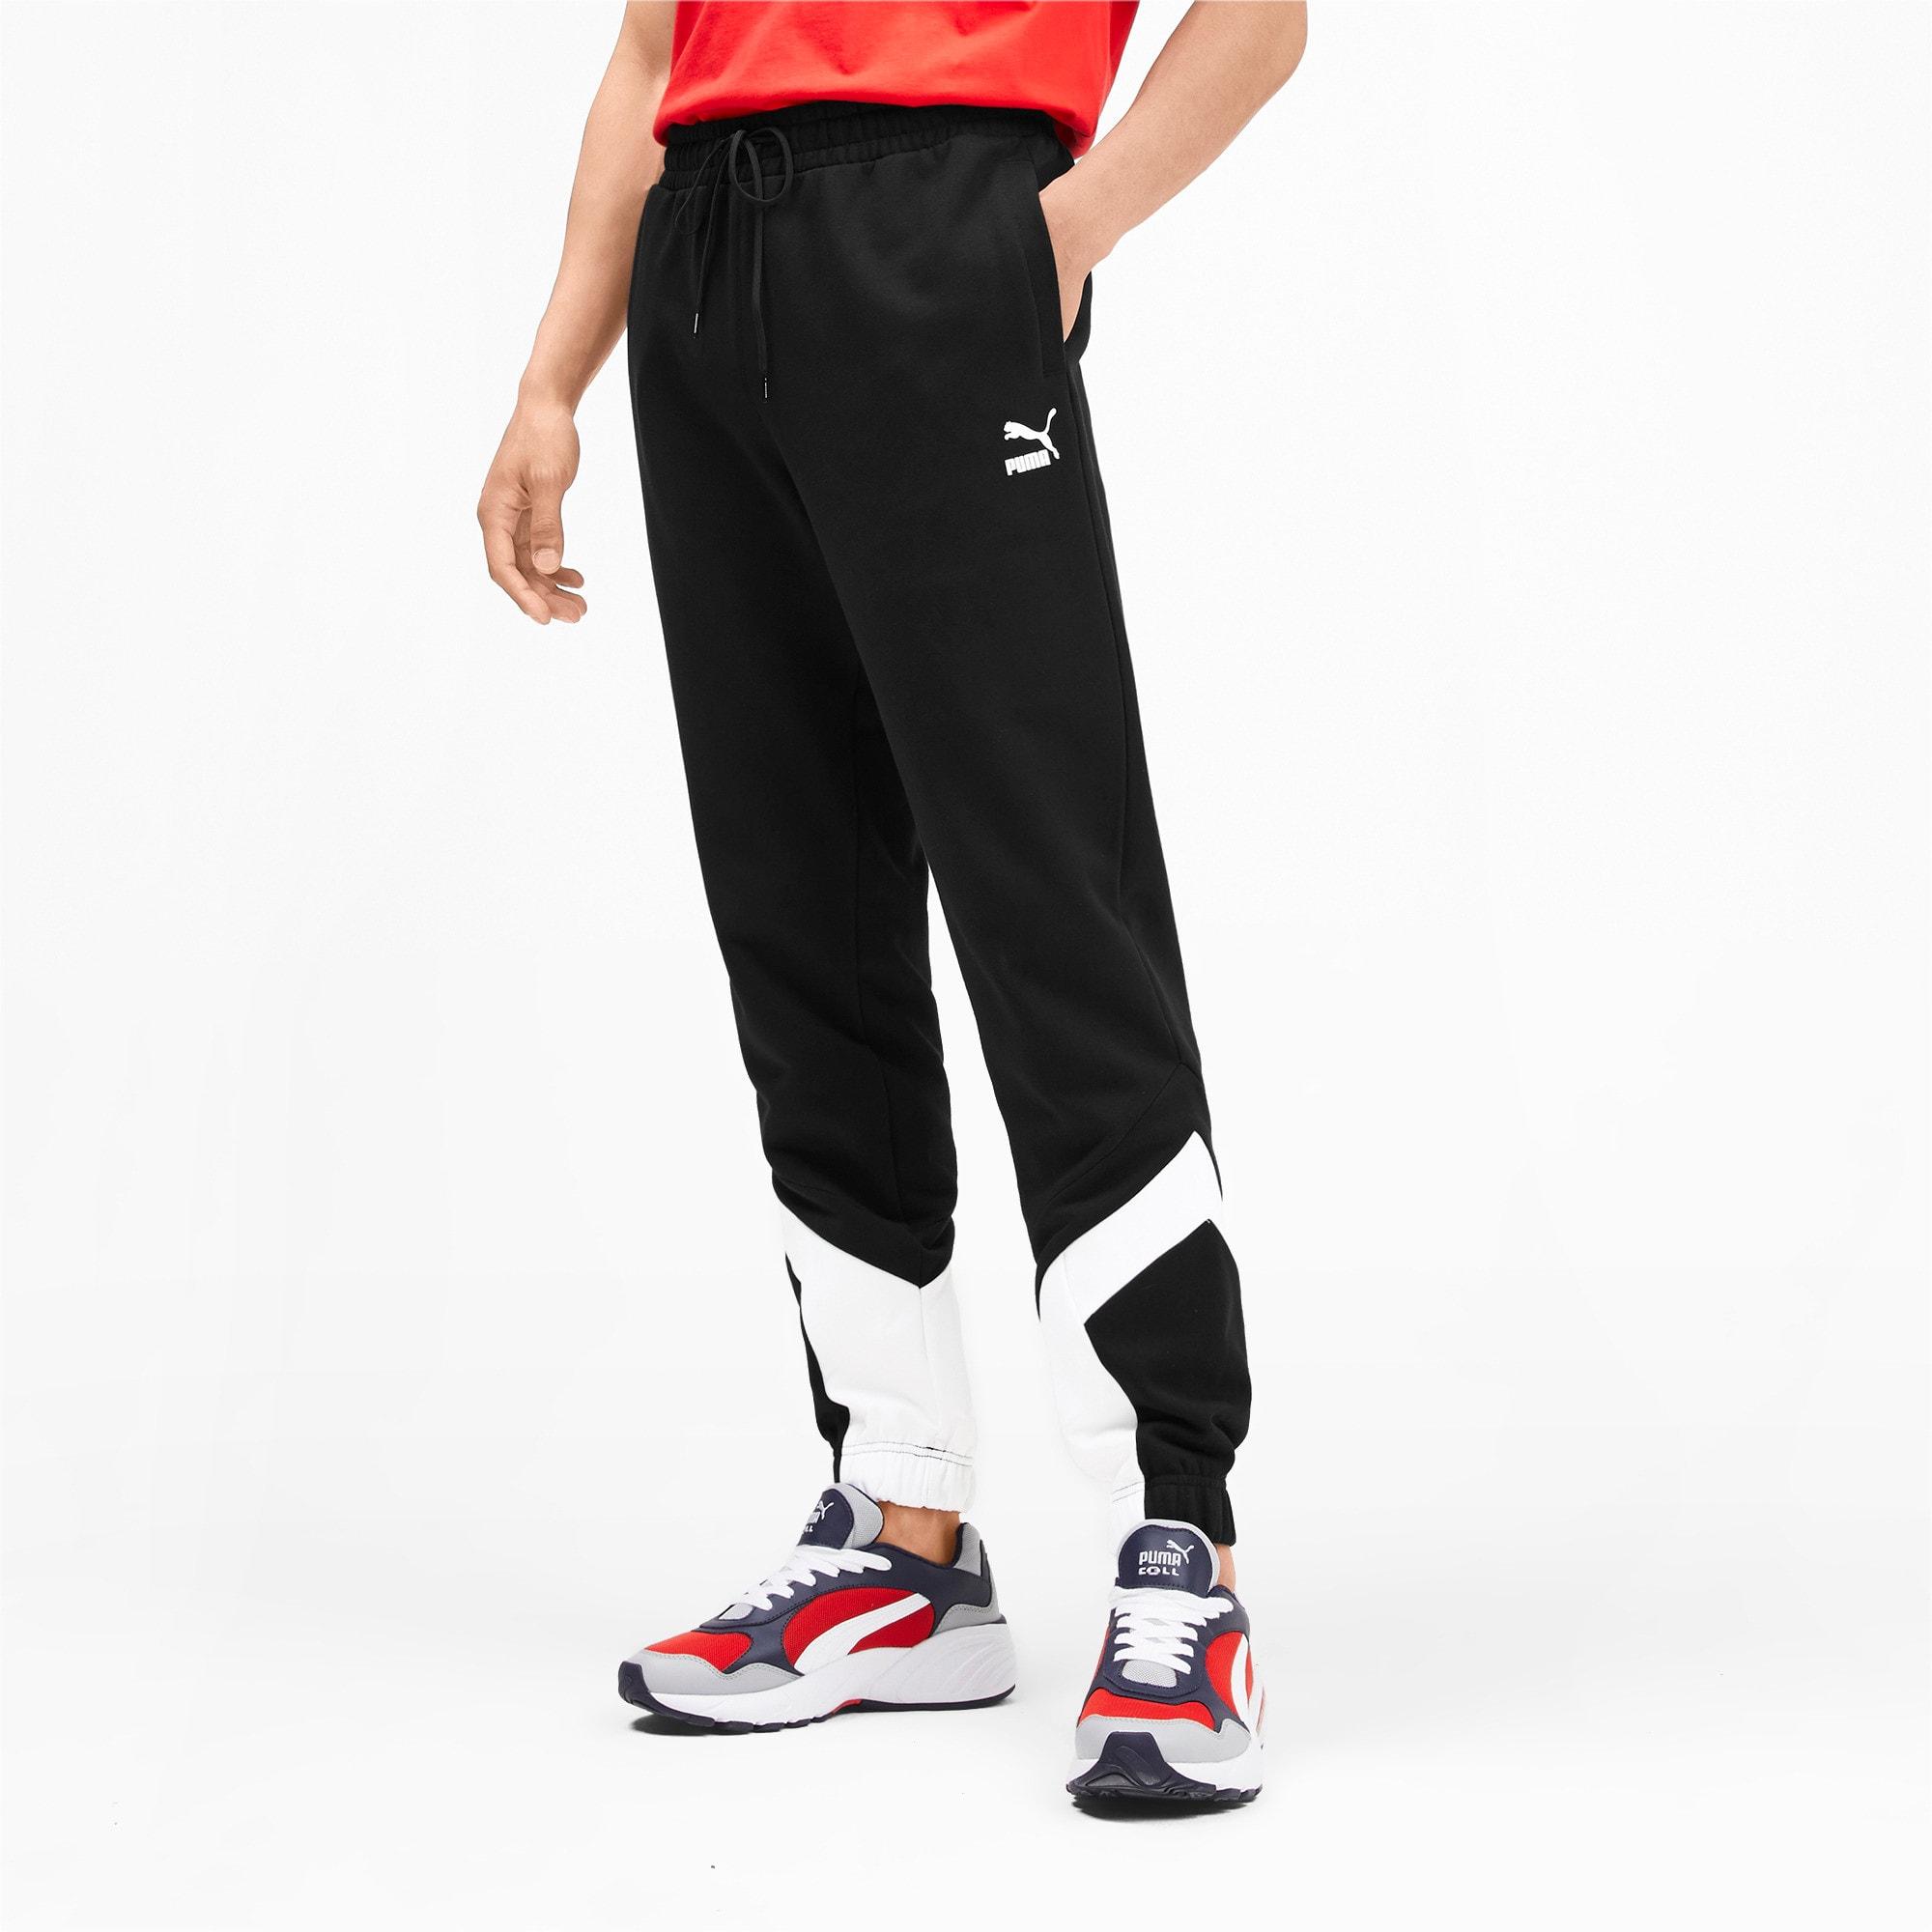 Miniatura 2 de Pantalones deportivos Iconic MCS de hombre, Puma Black, mediano